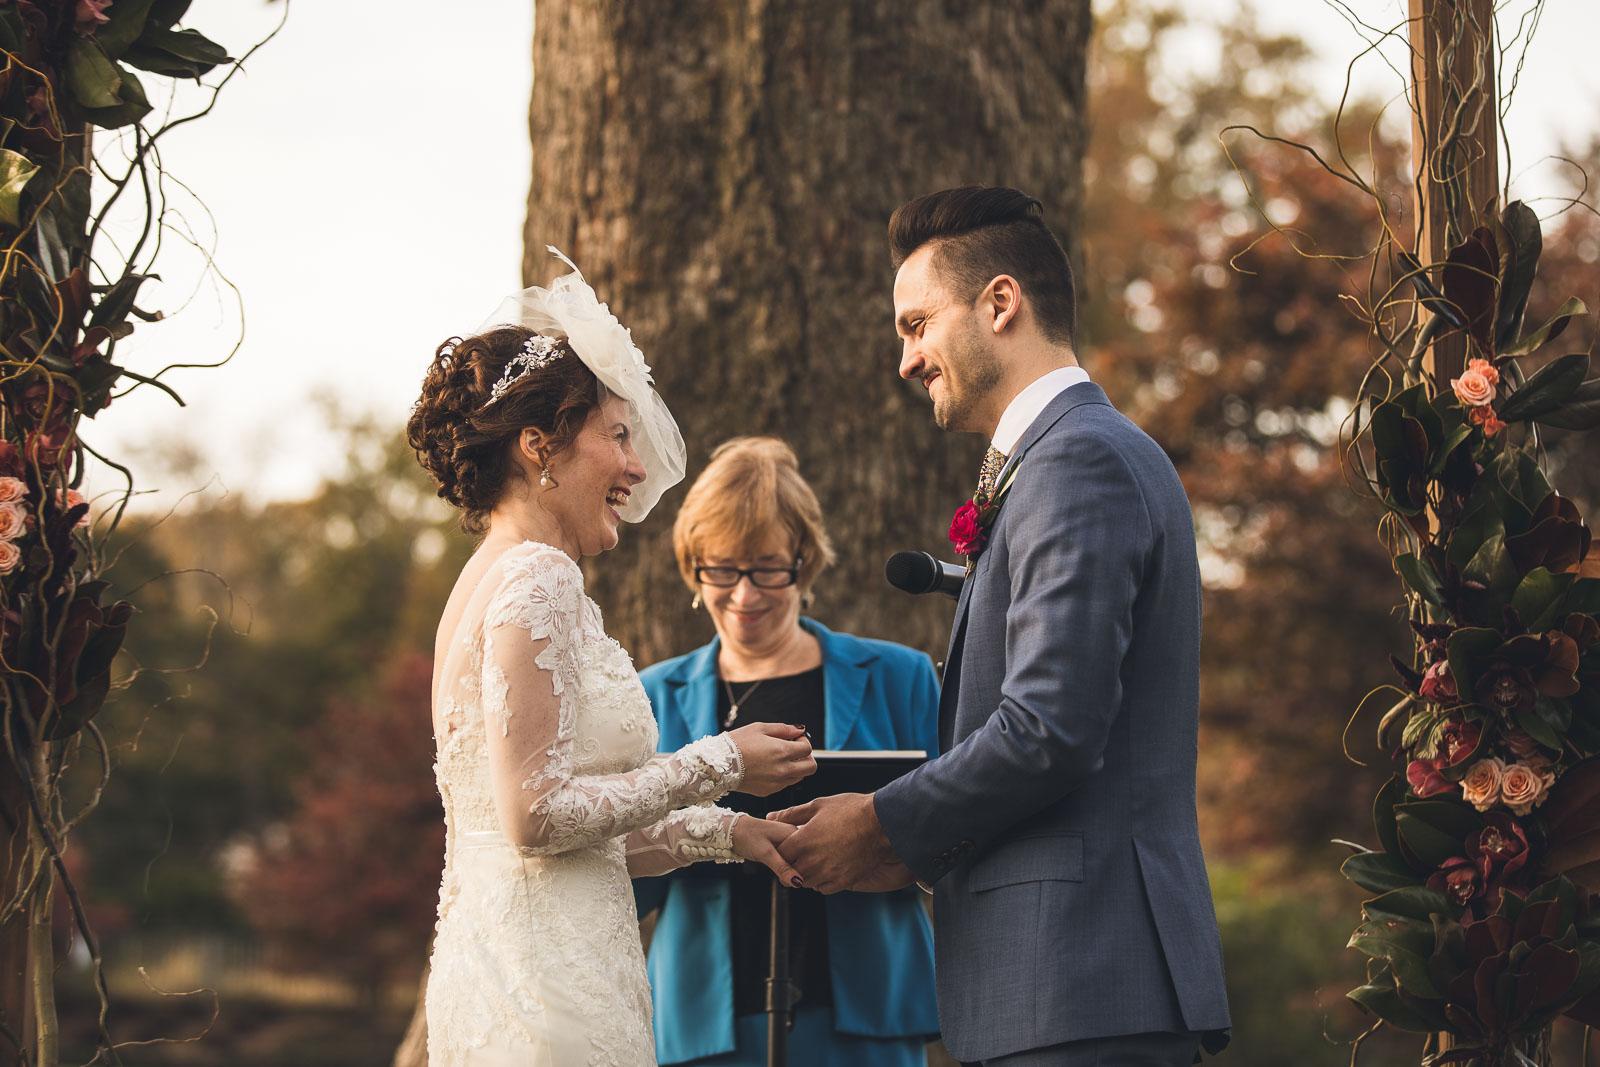 Wedding Ceremony Photography Orange Lawn Tennis Club